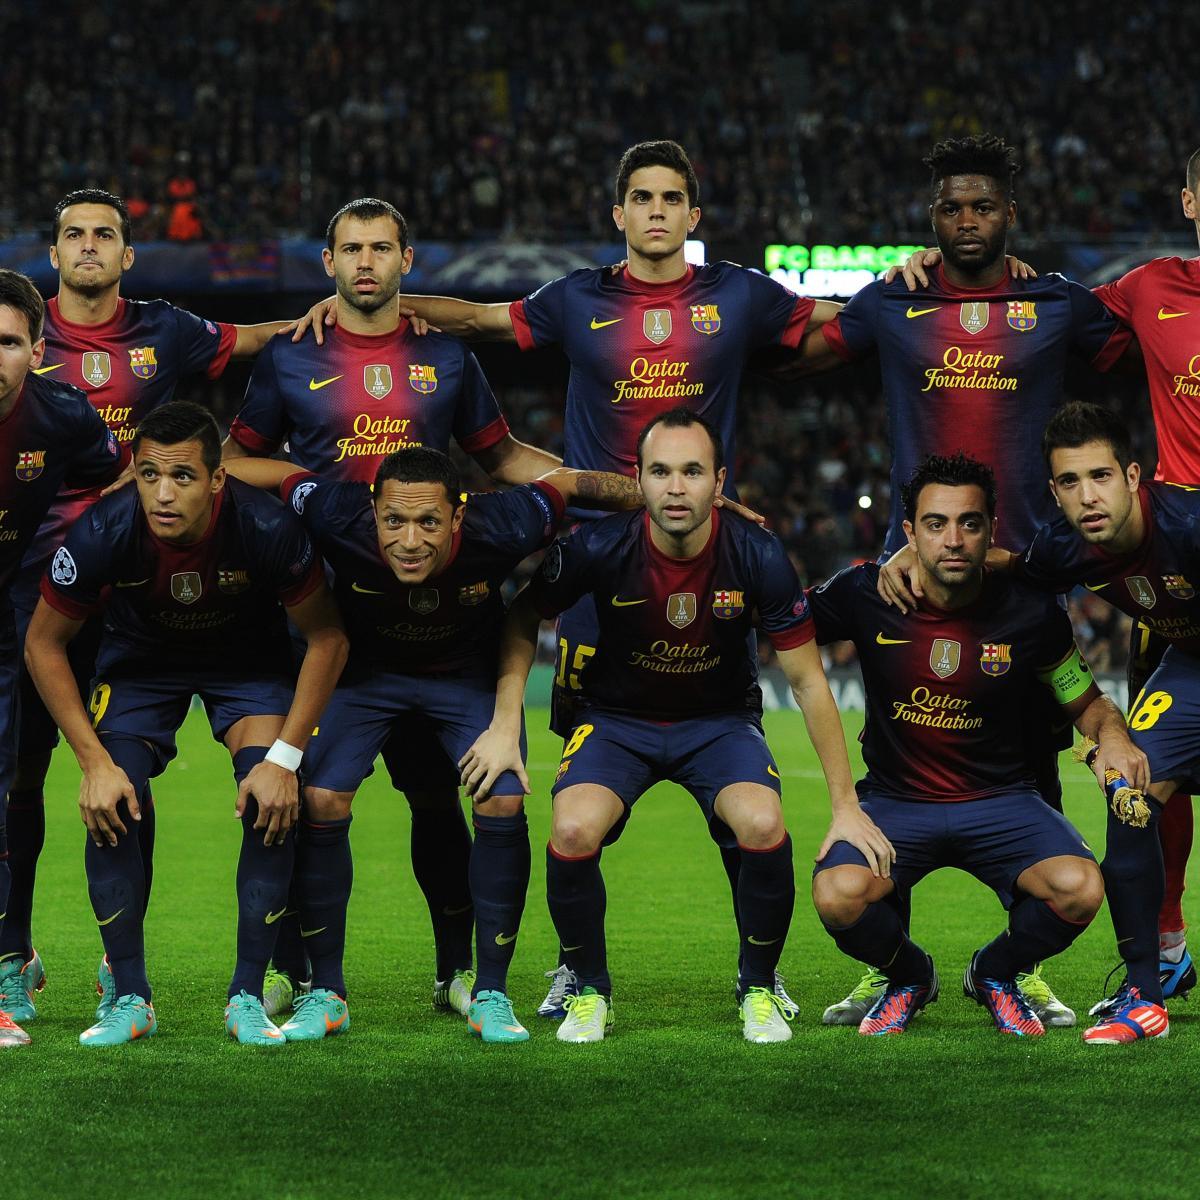 FC Barcelona Vs. Celta Vigo: 6 Bold Predictions